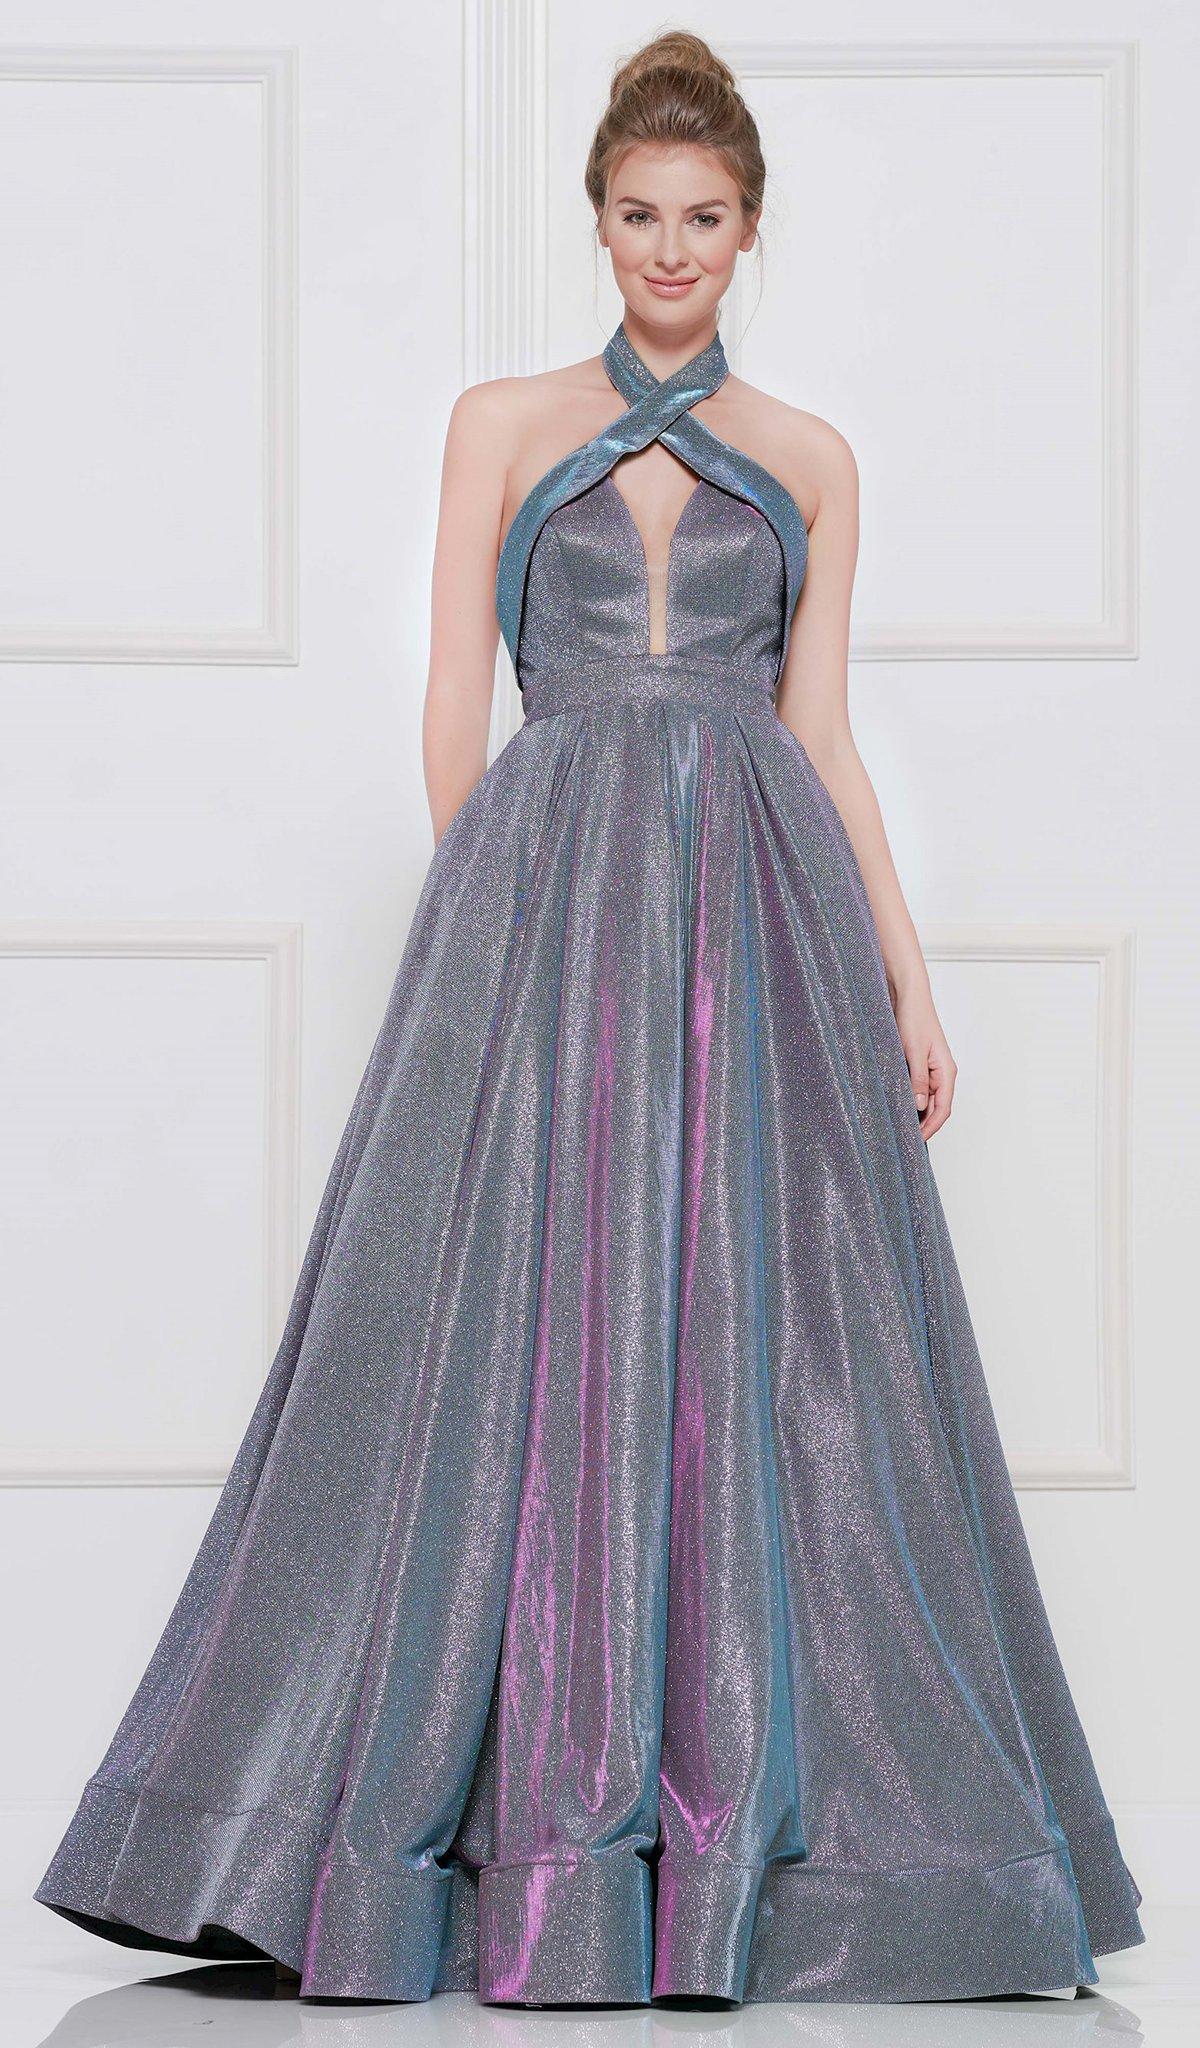 Colors Dress - 2094 Metallic Glitter Knit Halter Ballgown